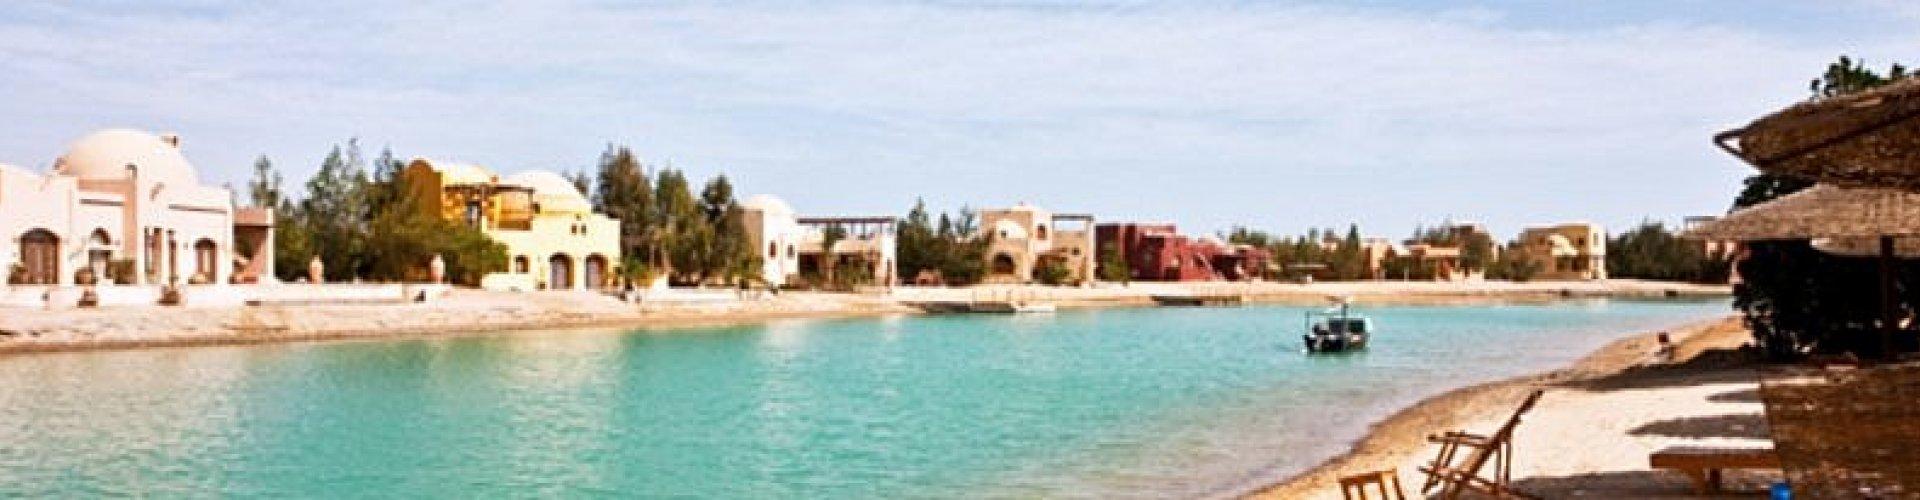 Urlaub Hurghada Safaga Mit Kindern Familienurlaub Ferien